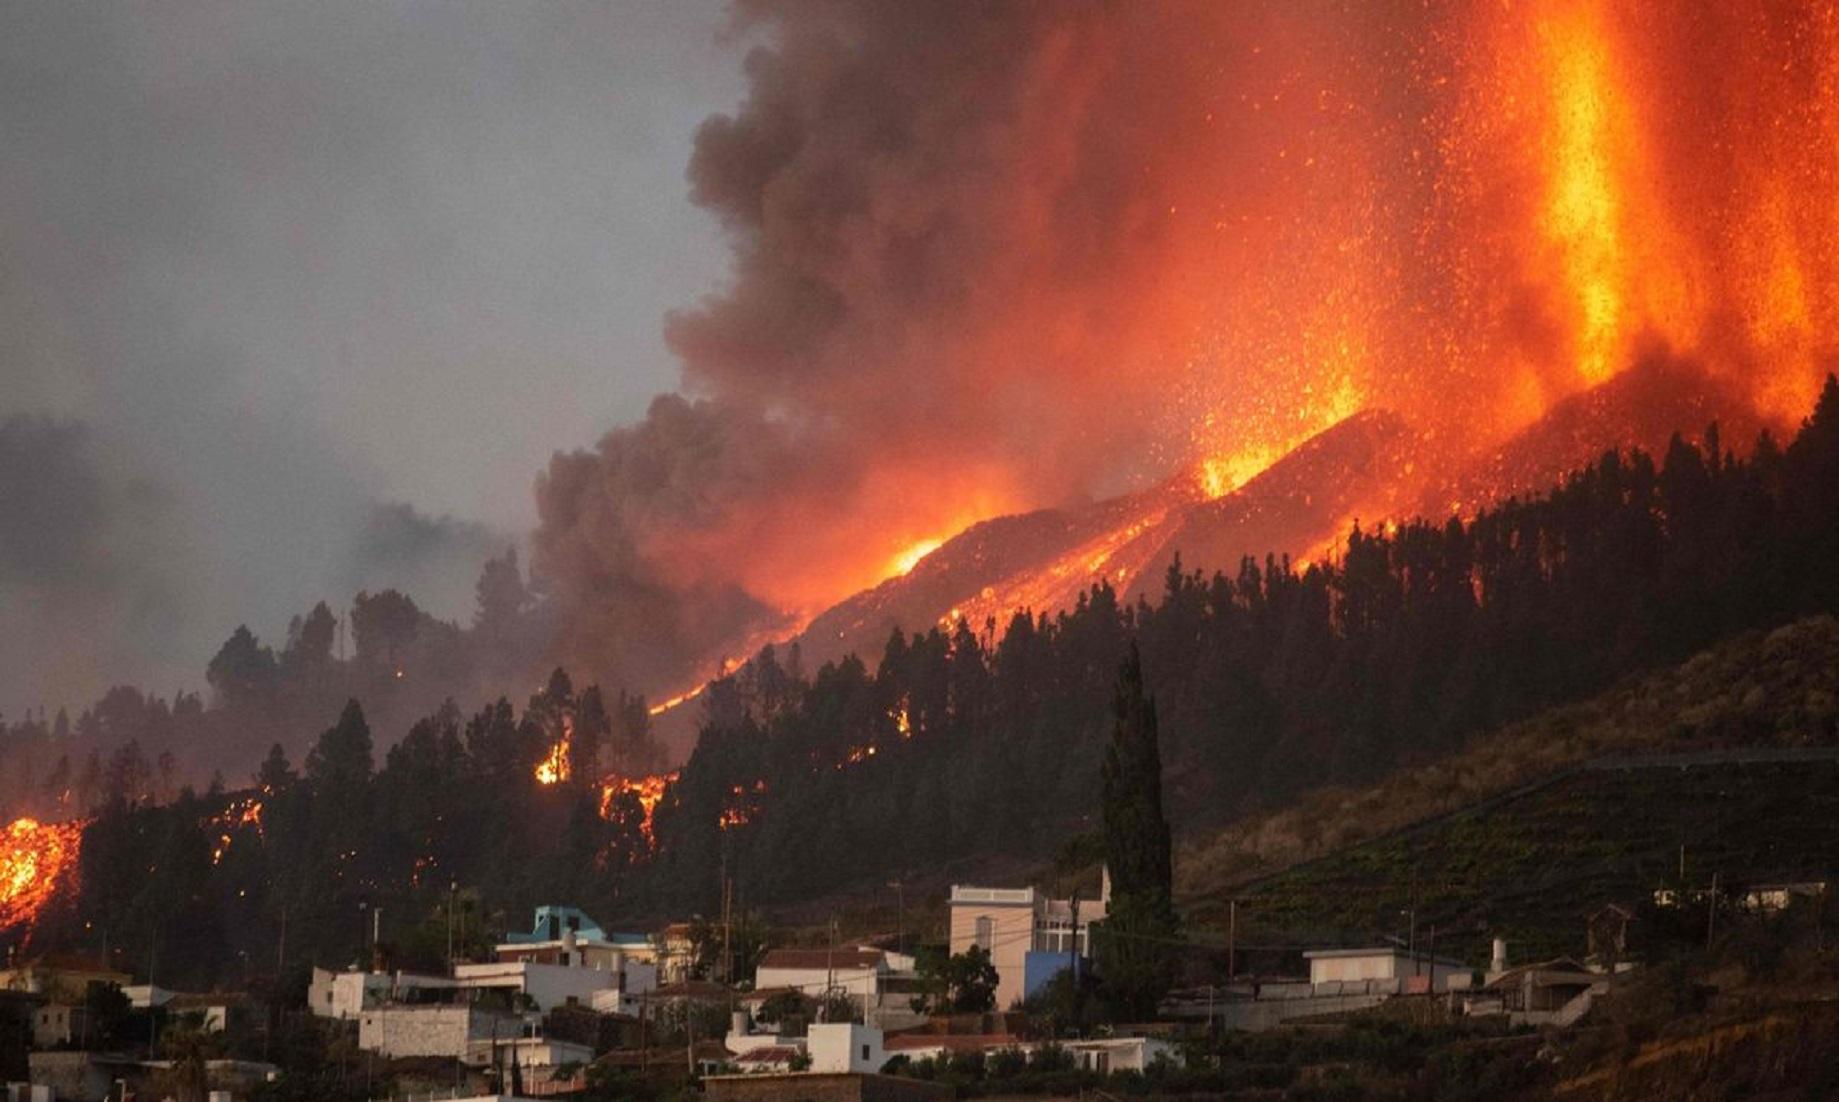 Over 5,000 People Evacuated As Volcano Erupts On Spain's La Palma Island